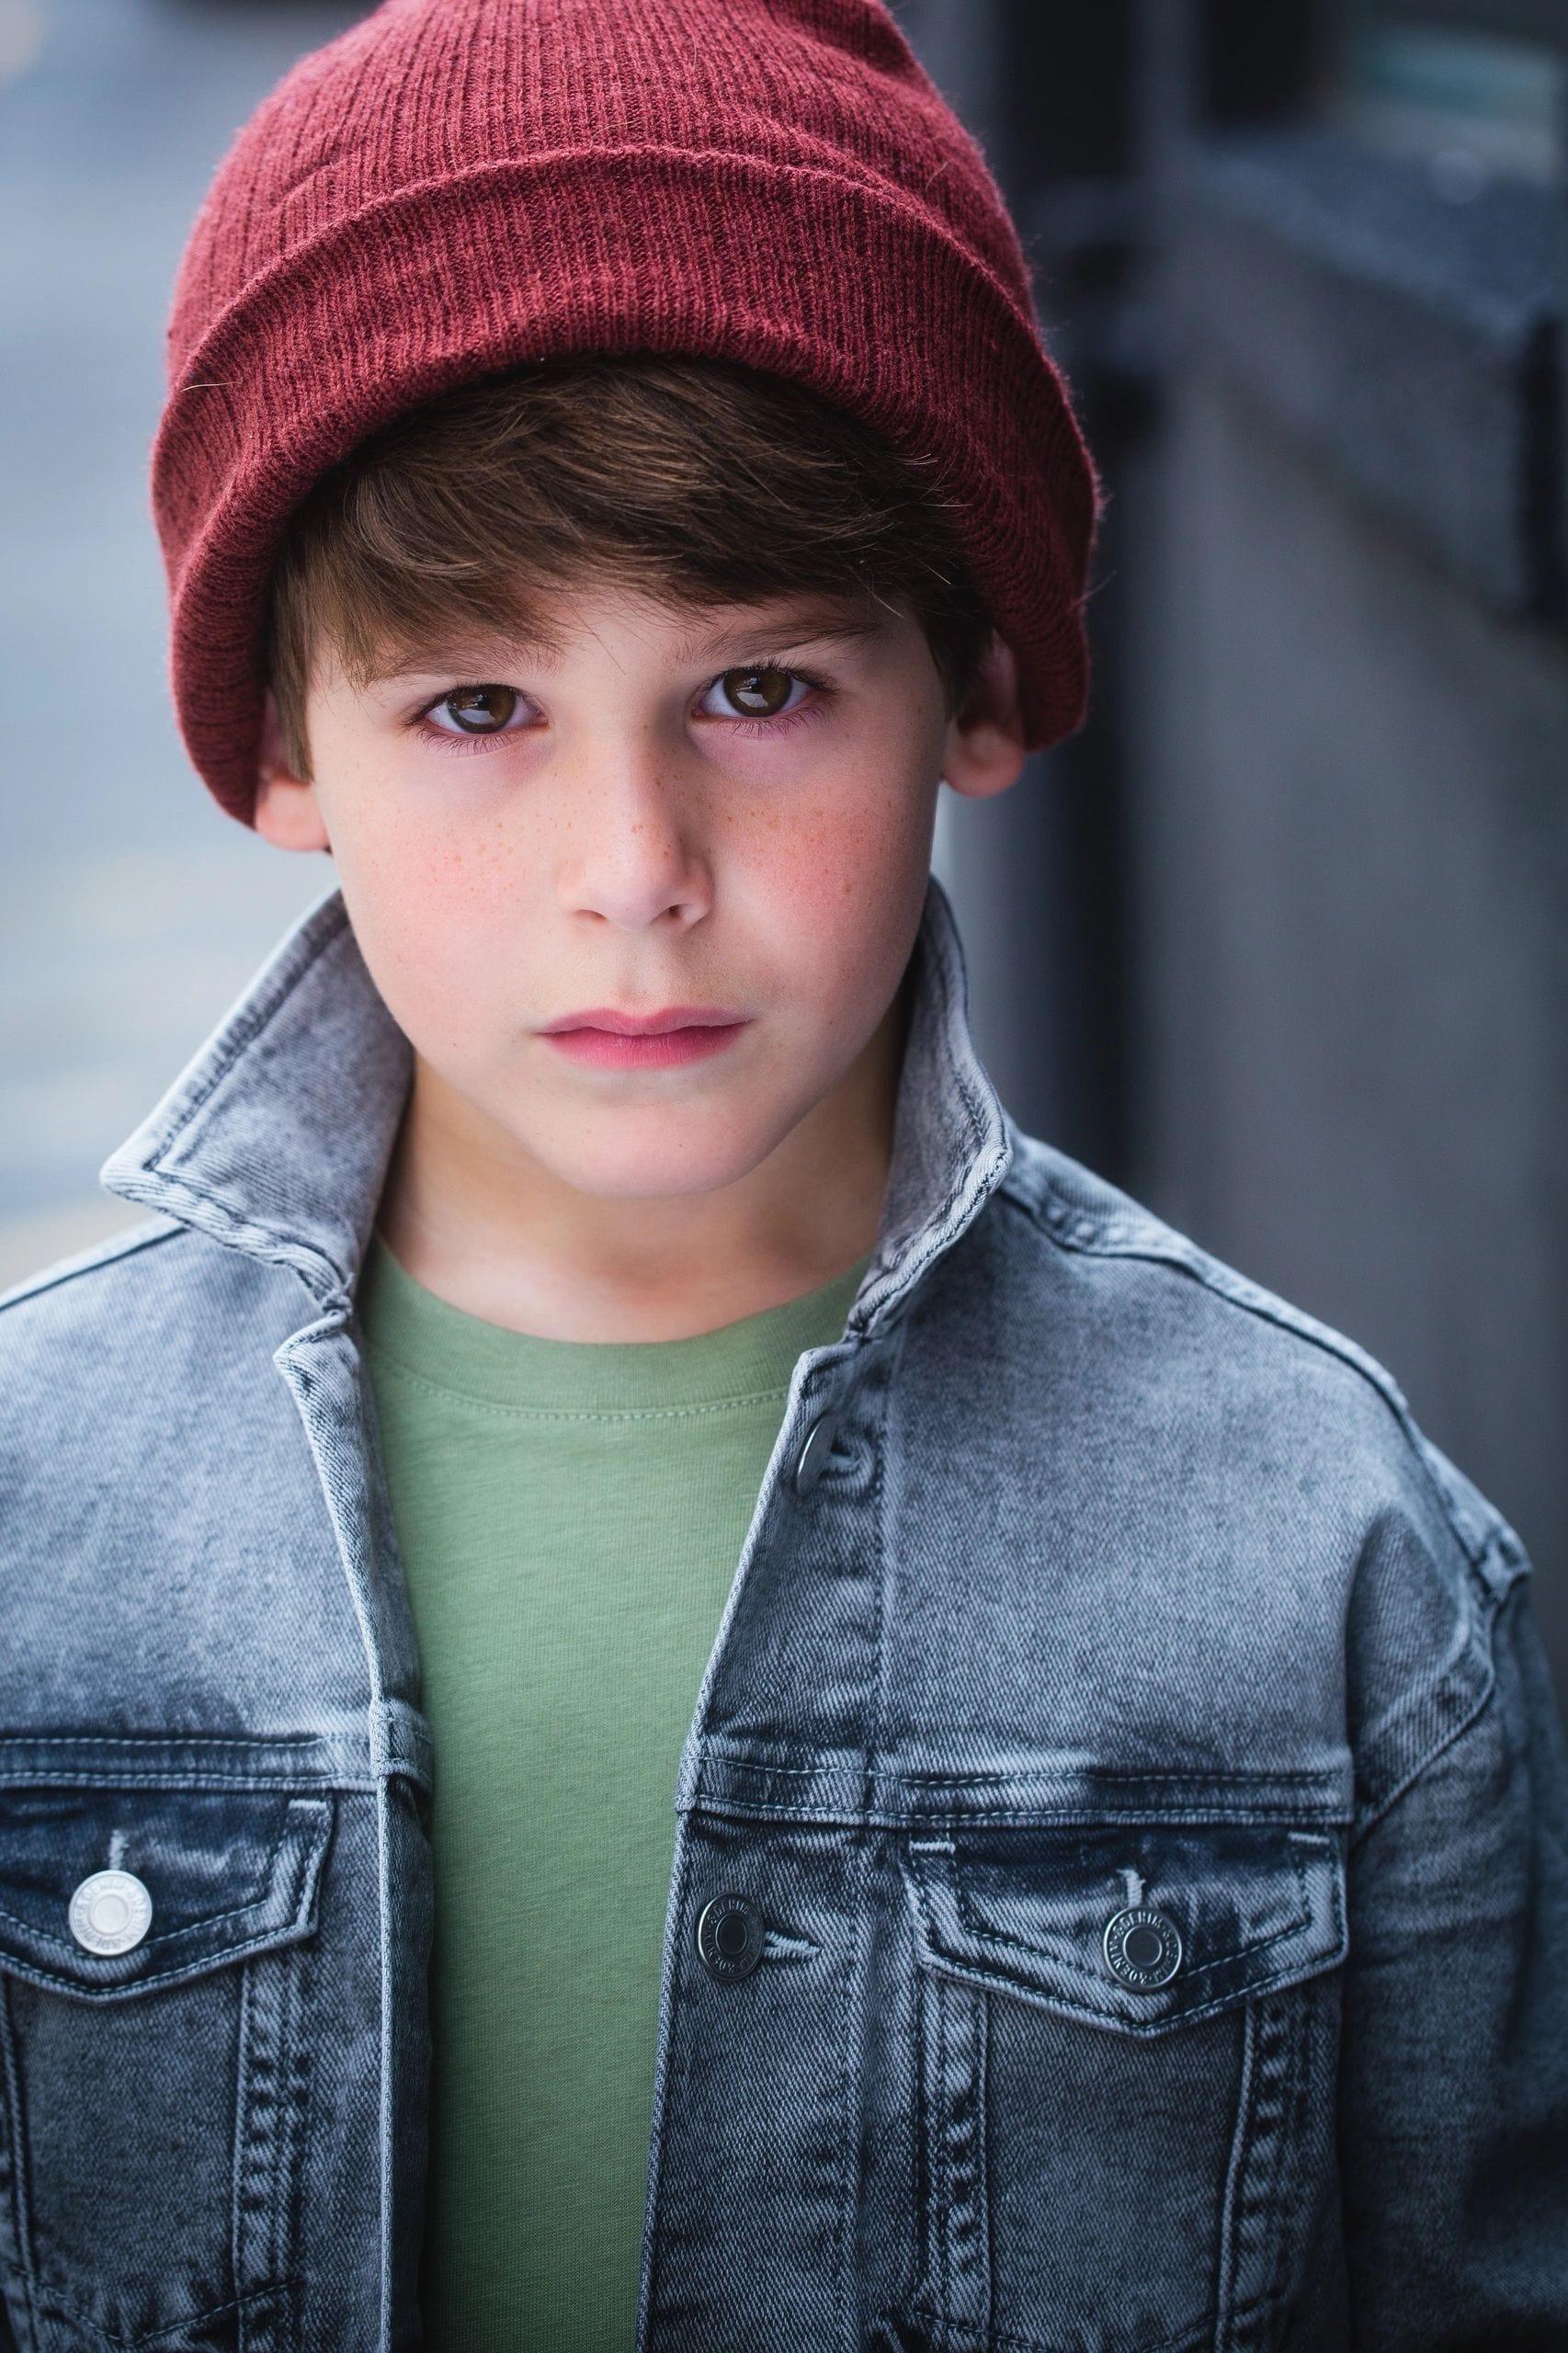 Mason Cufari